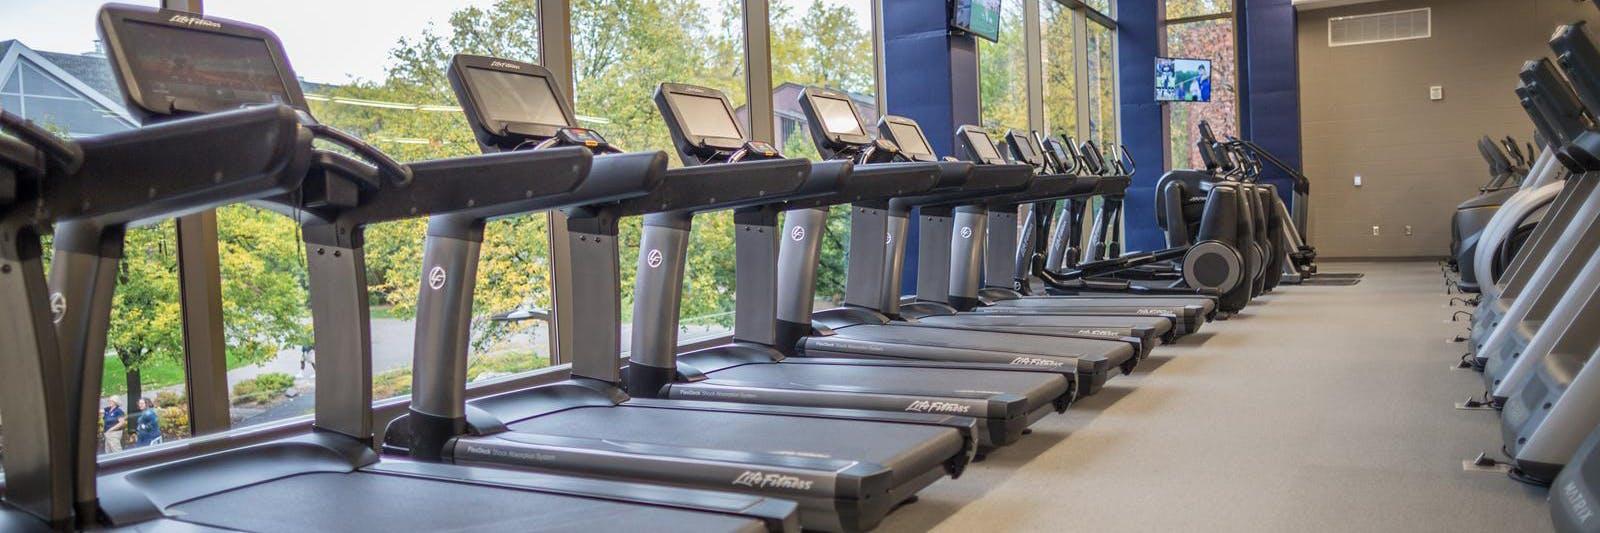 Wellness Center Empty Treadmills